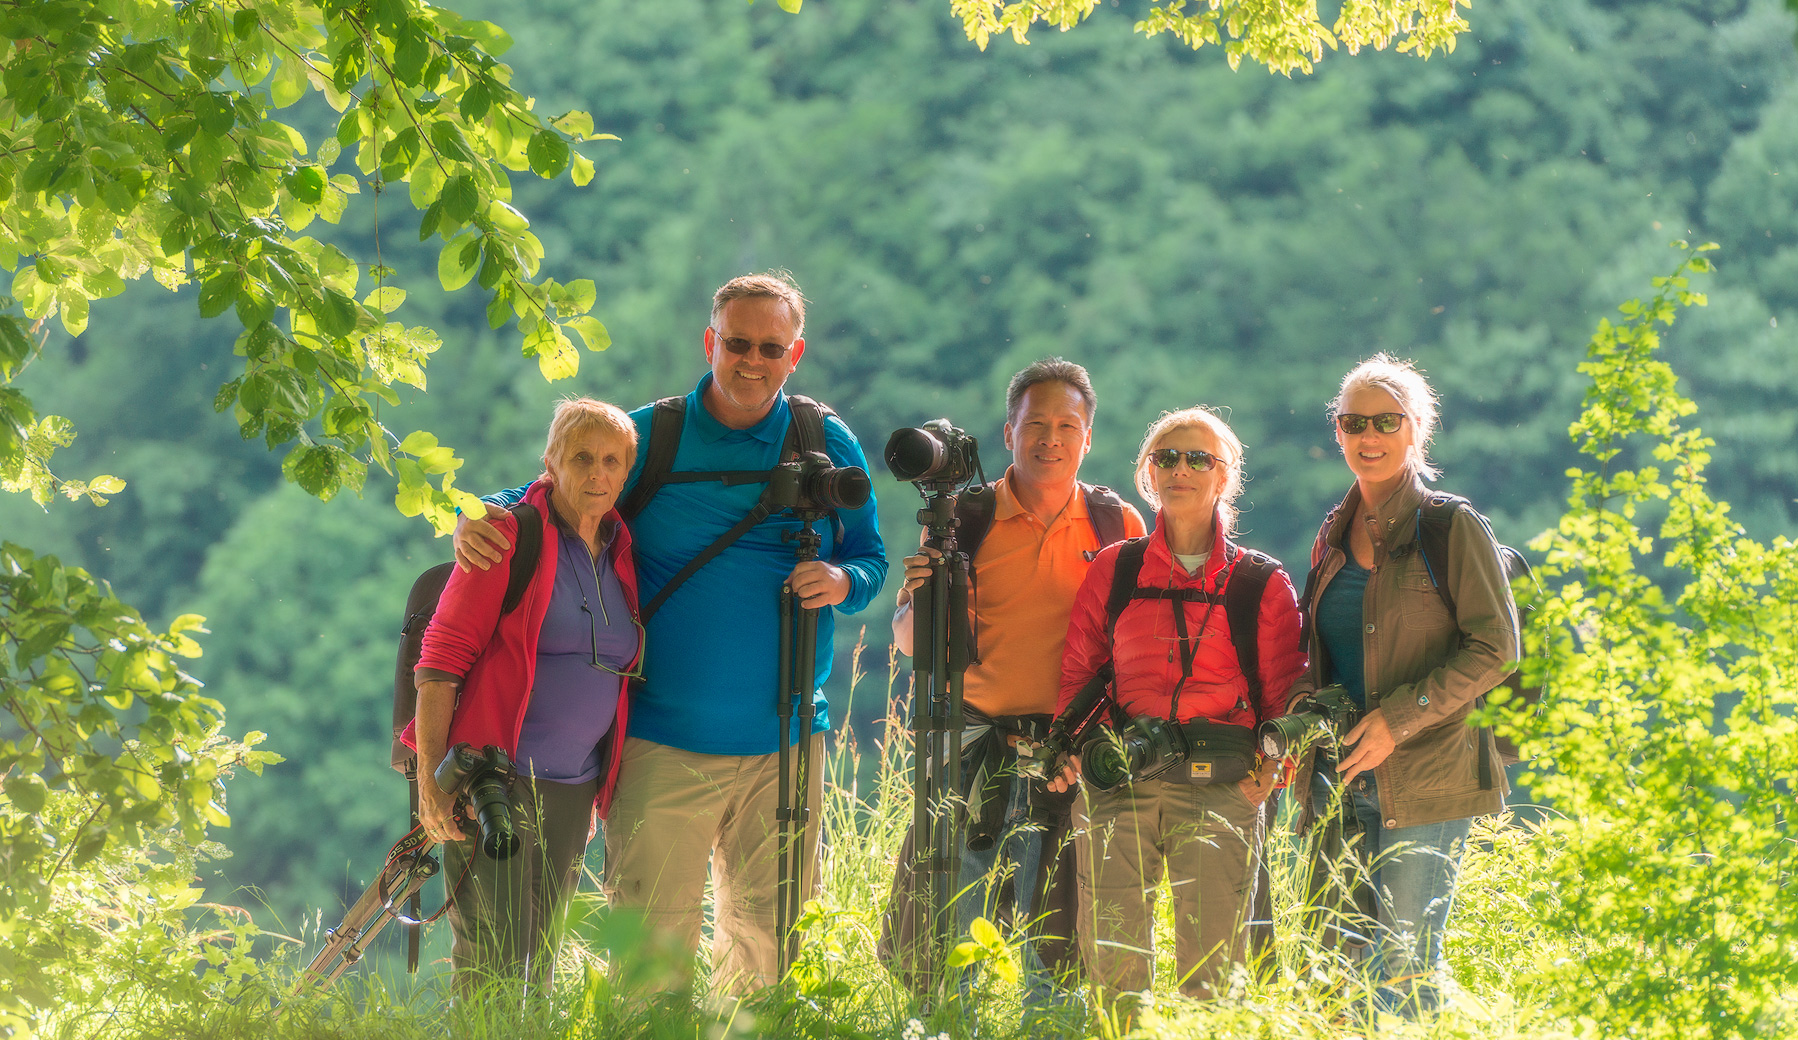 Photography workshop at Plitvice Lakes, Croatia